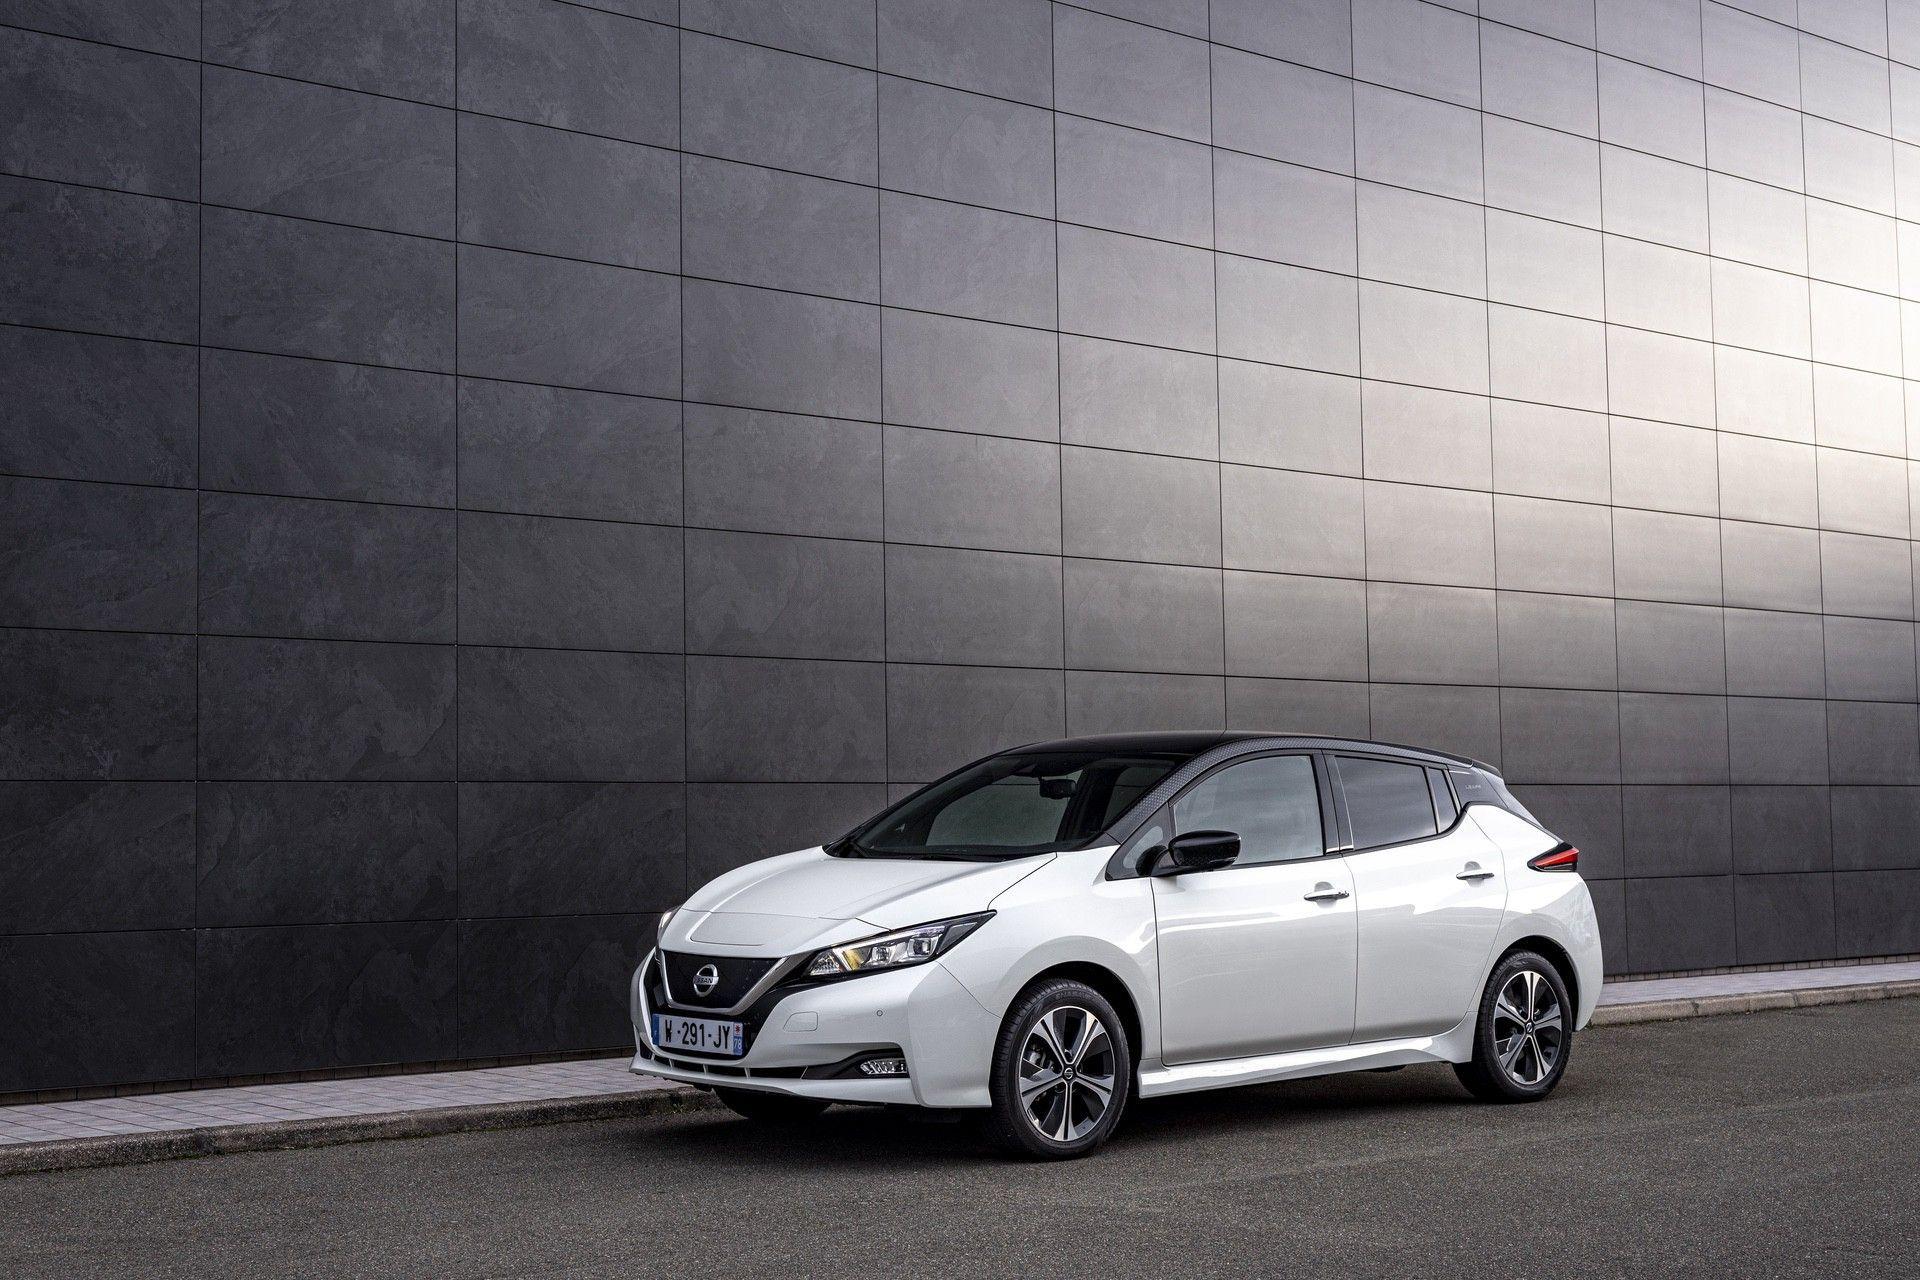 Nissan_Leaf10_special_edition-0002